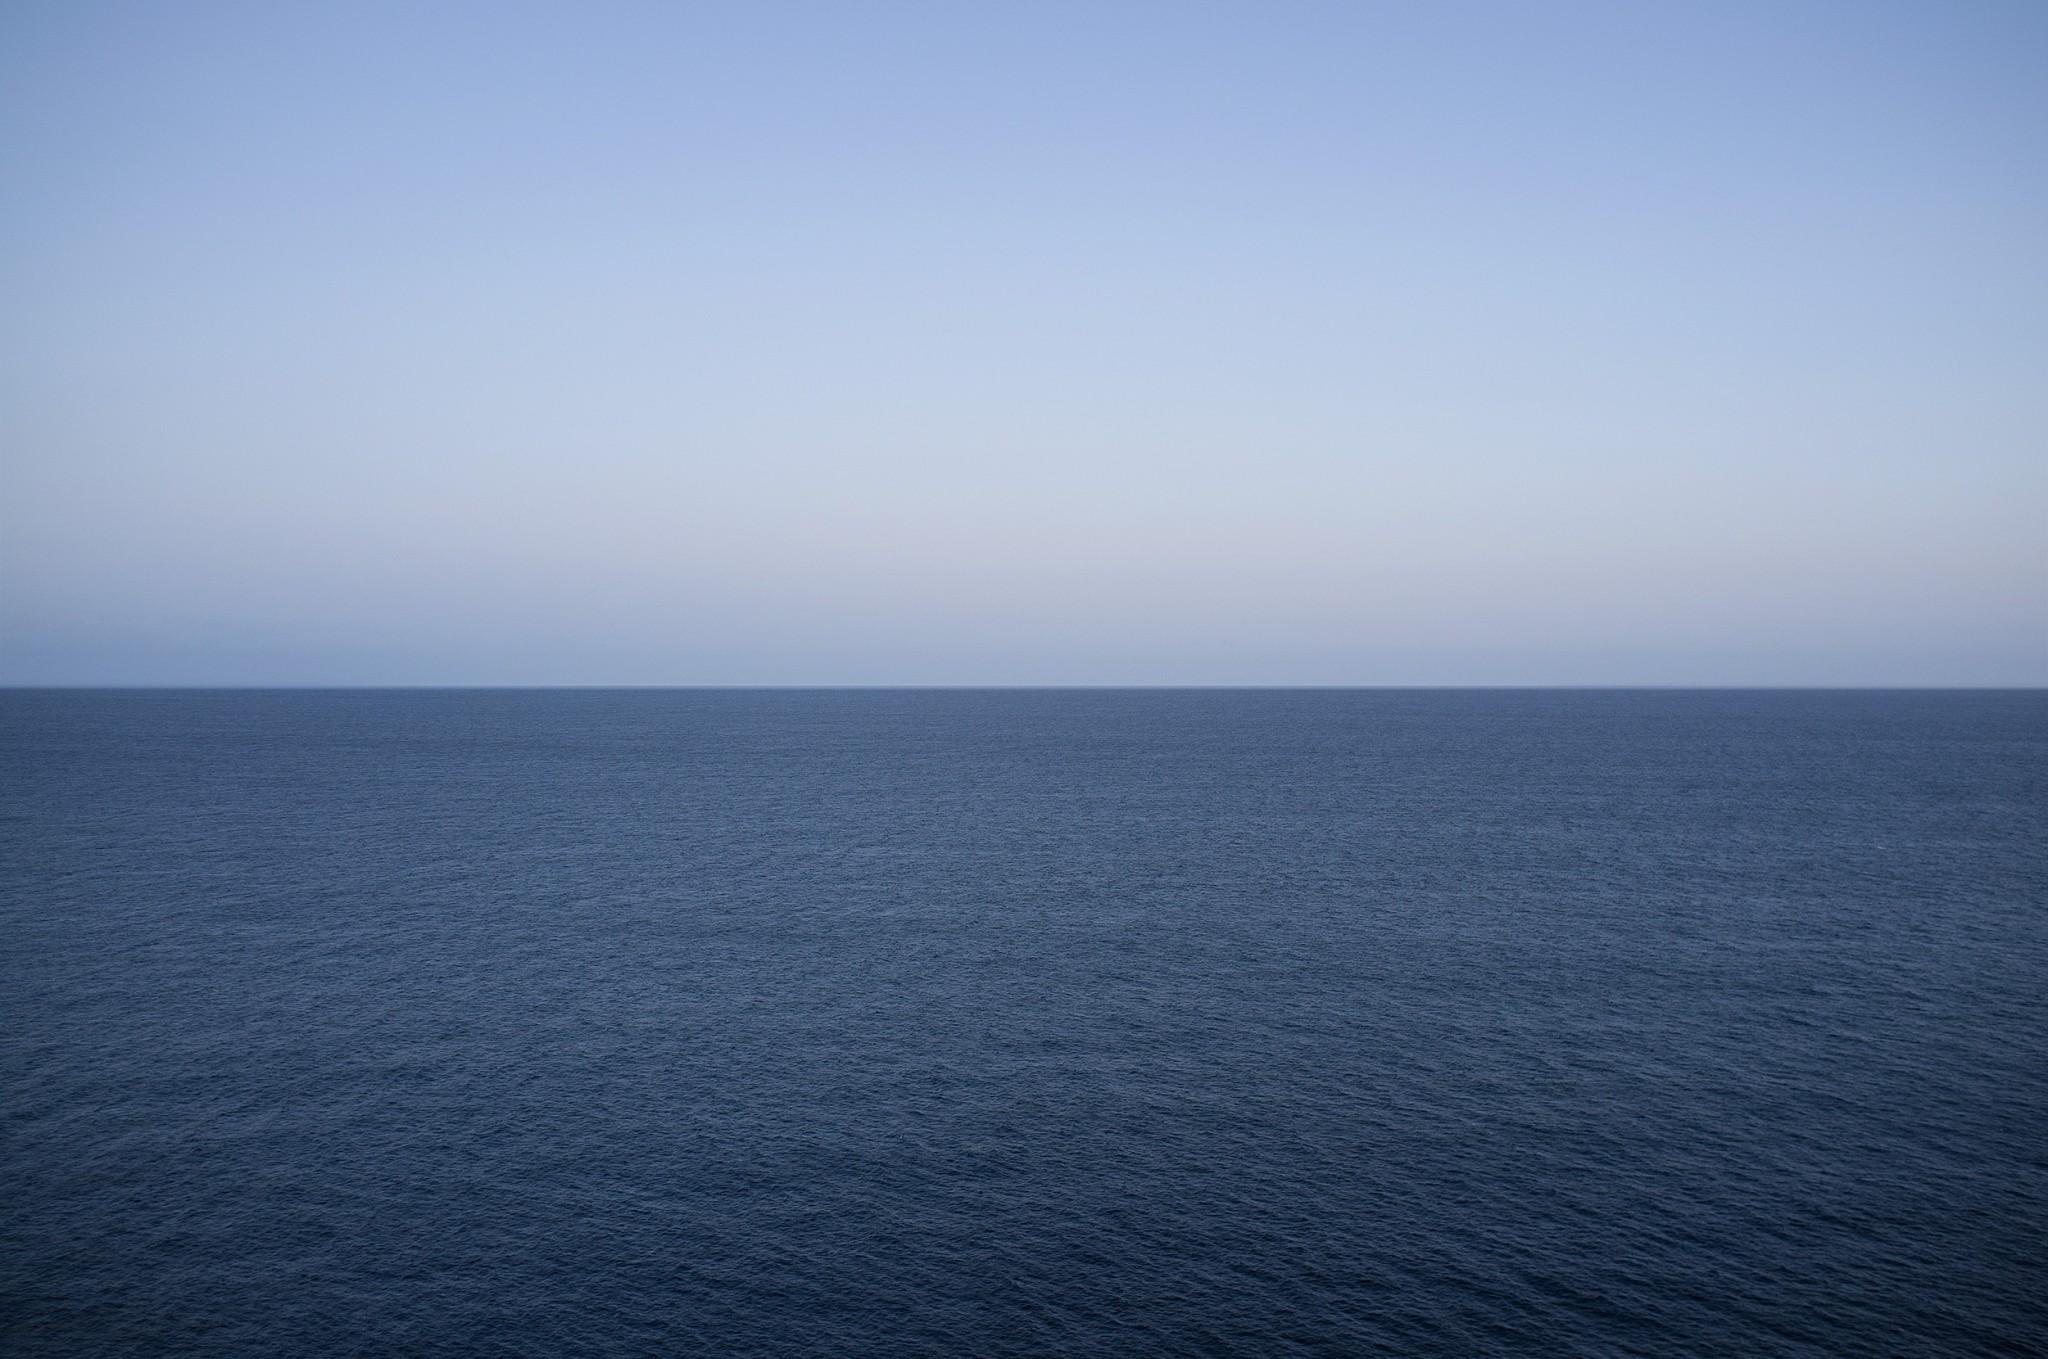 ocean IIII | © Fabrice Villard